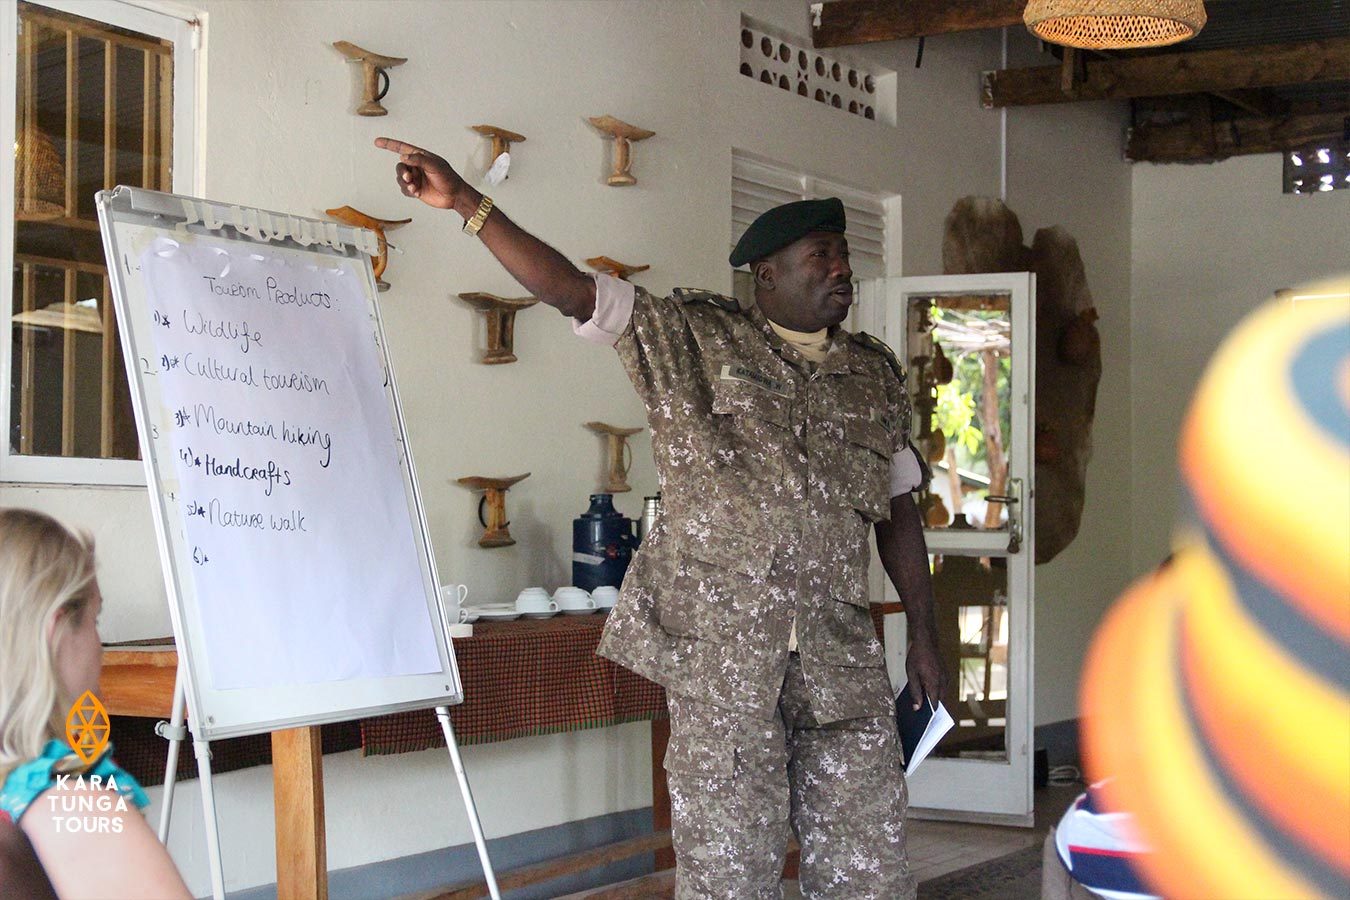 kara-tunga-undp-usaga-uwa-karamoja-uganda-tour-guides-moroto-training-5